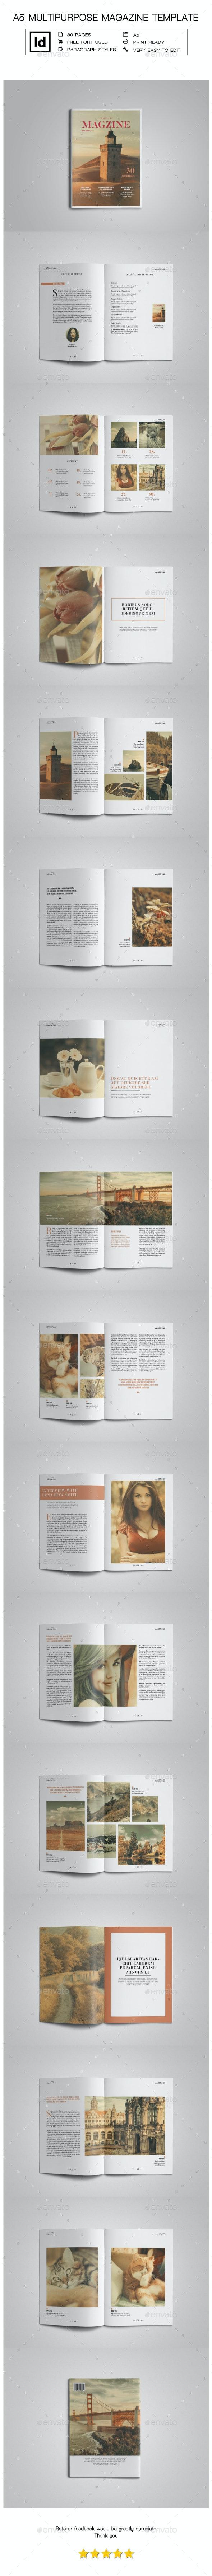 A5 Multipurpose Magazine Template - Magazines Print Templates